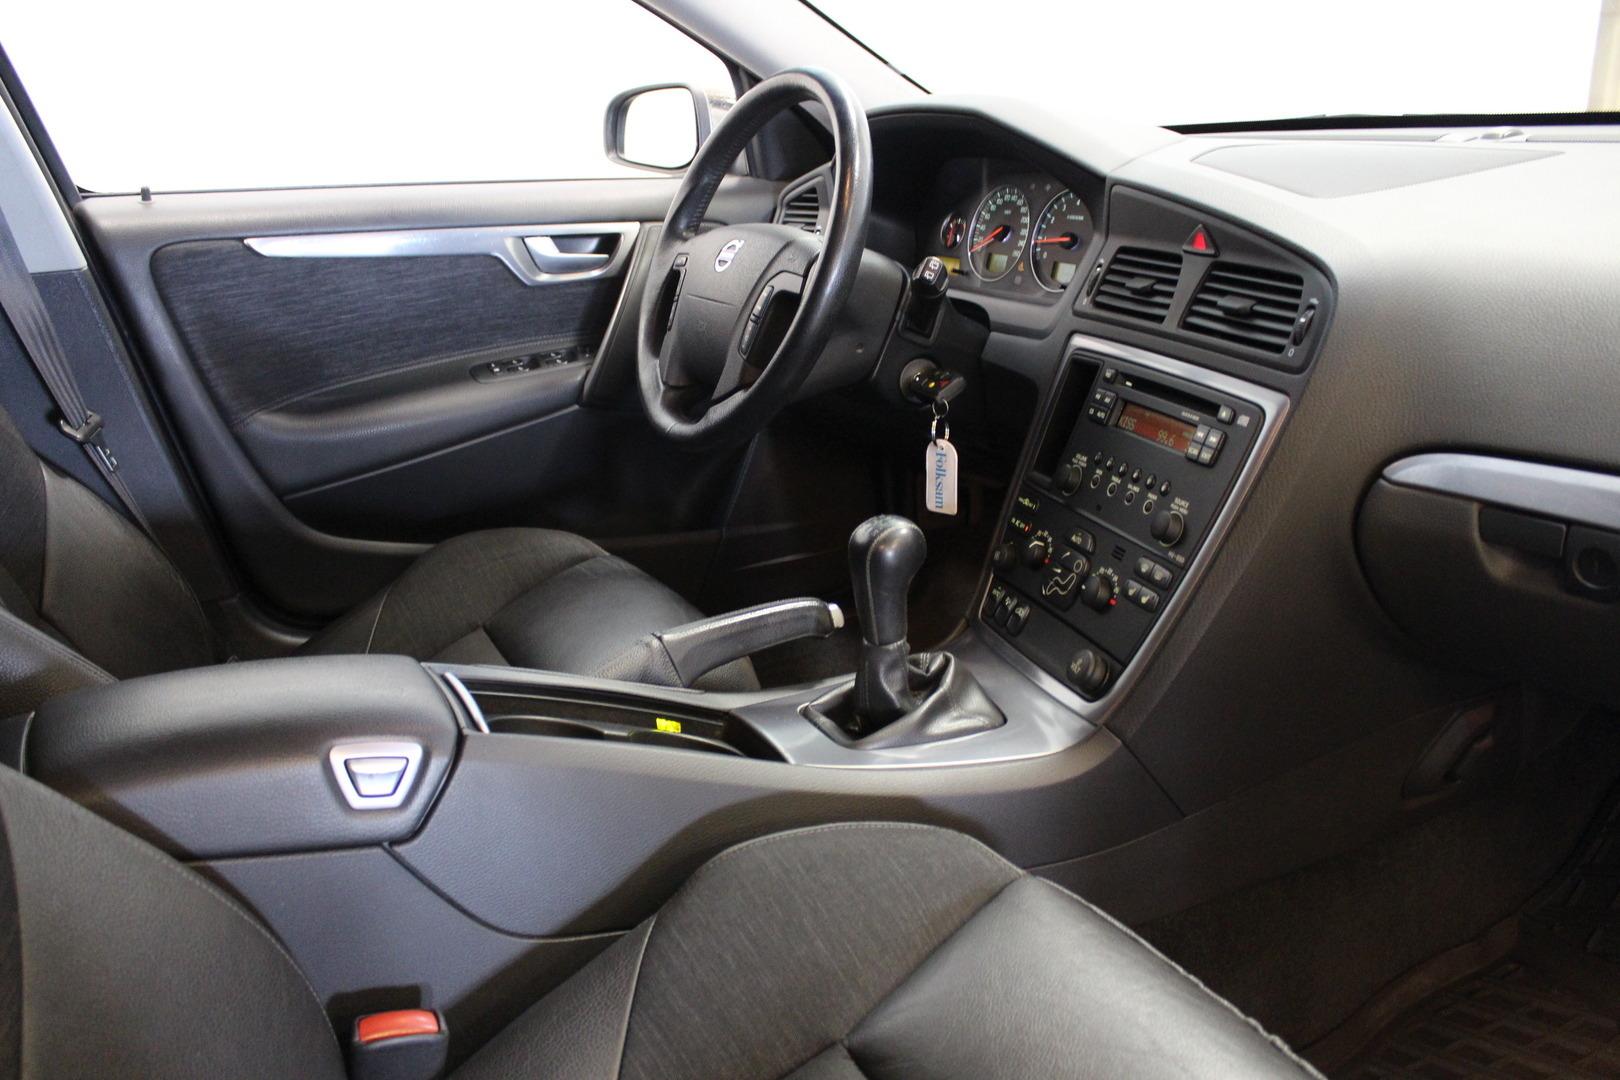 Volvo V70, 2.4i 170hv #Suomi-auto #Vähän ajettu #Puolinahat #Vakkari